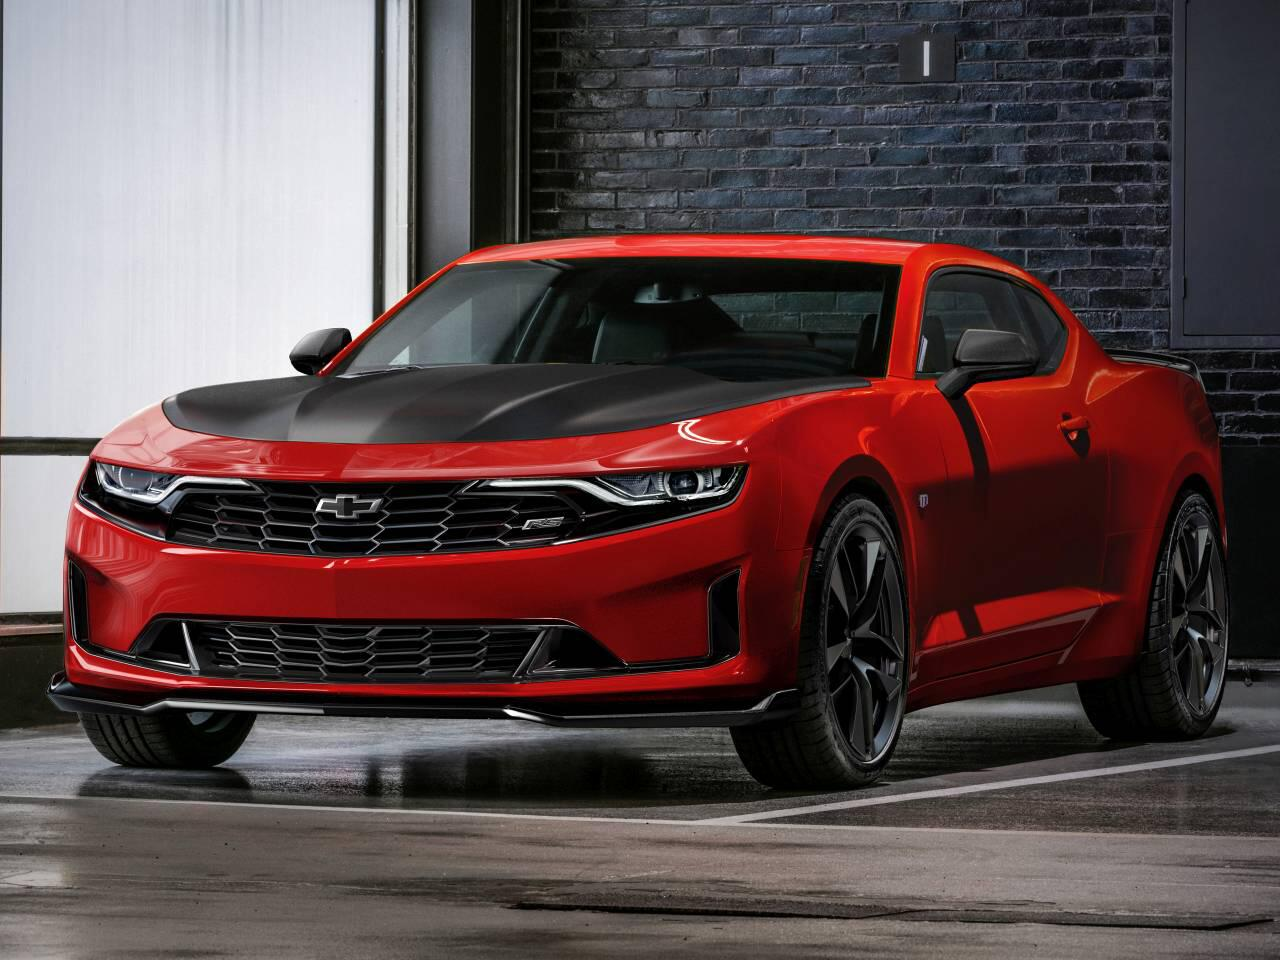 Bild zu Chevrolet Camaro Turbo 1LE (2019)